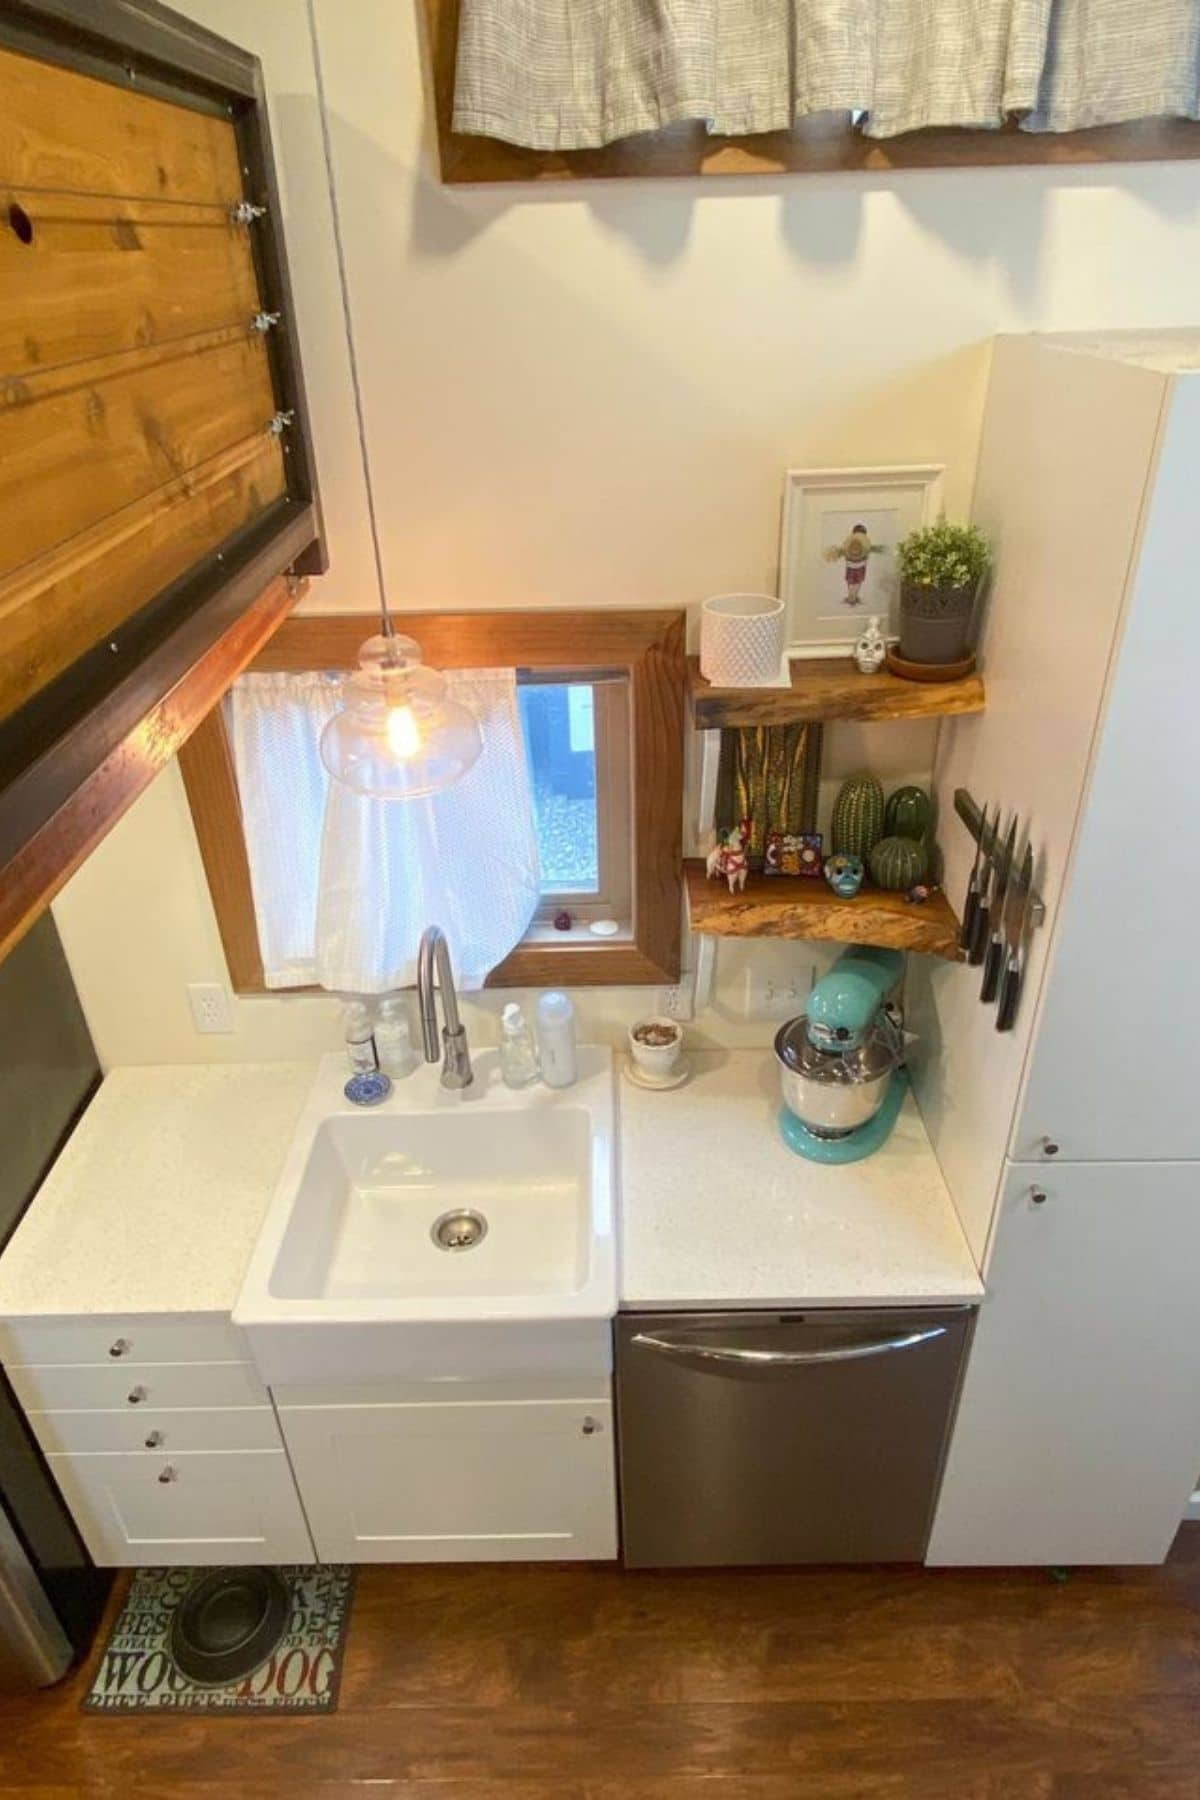 White sink next to stainless steel dishwasher